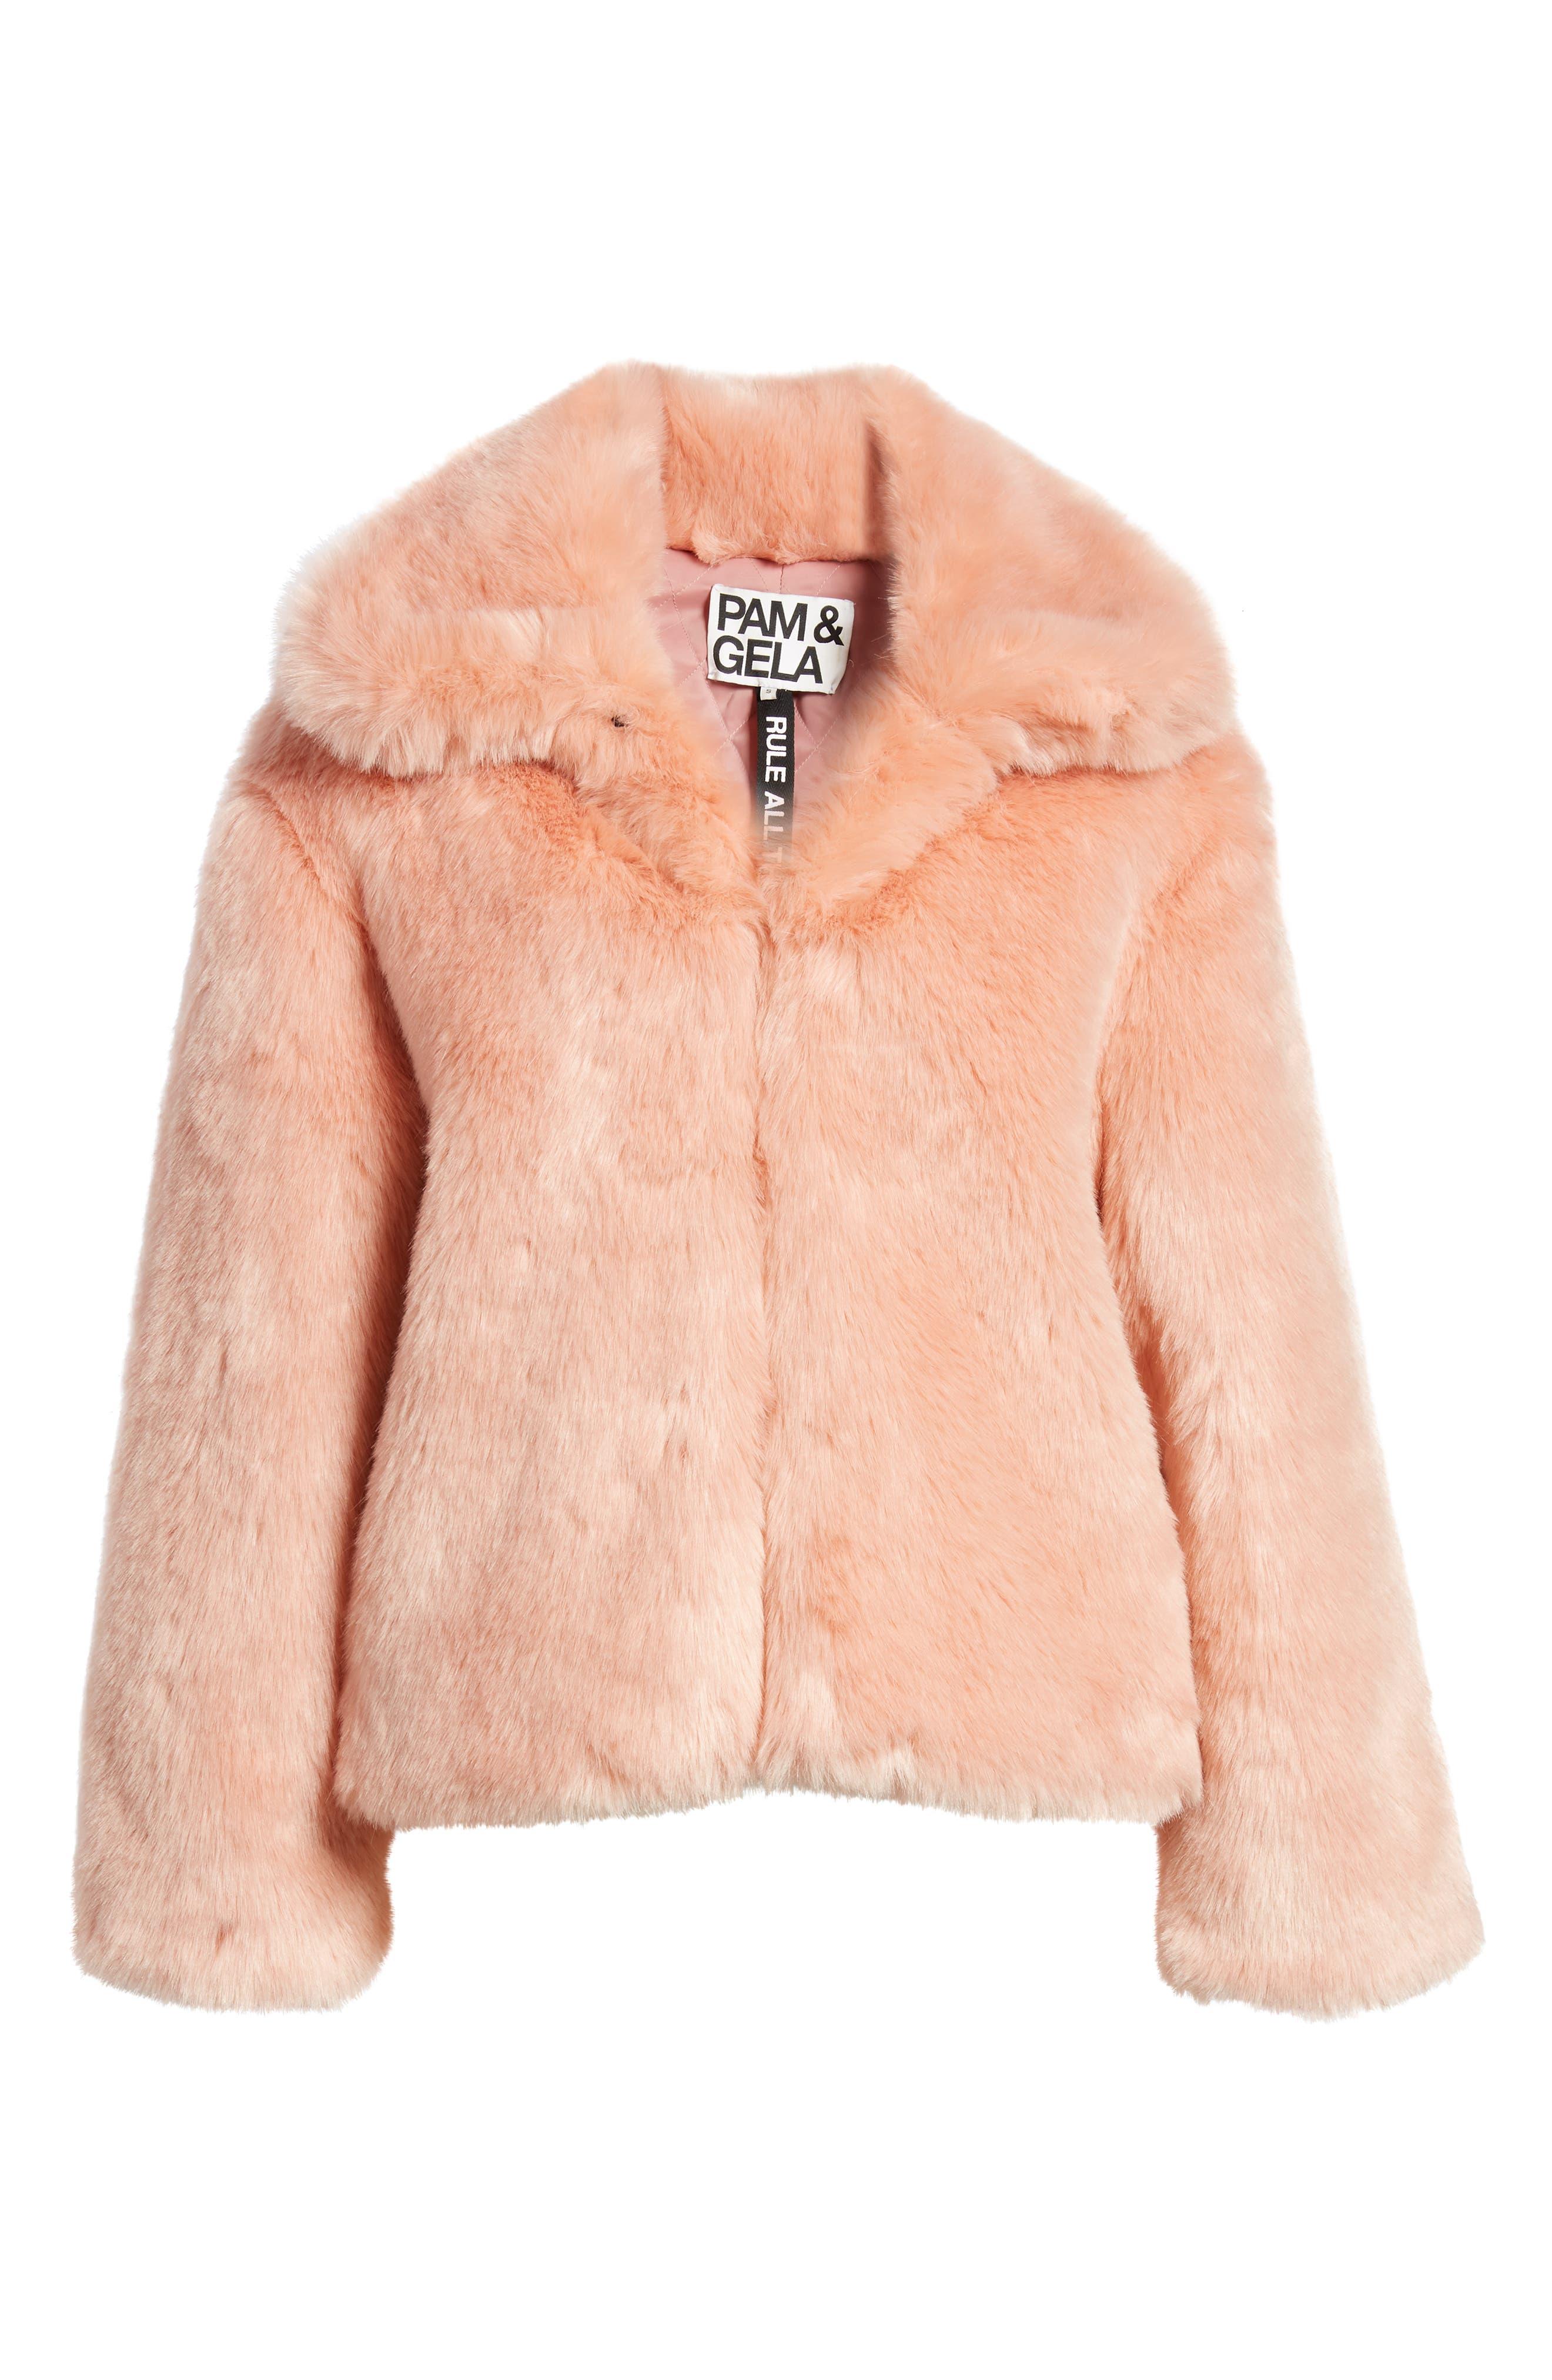 Boxy Faux Fur Coat,                             Alternate thumbnail 6, color,                             CHERRY BLOSSOM